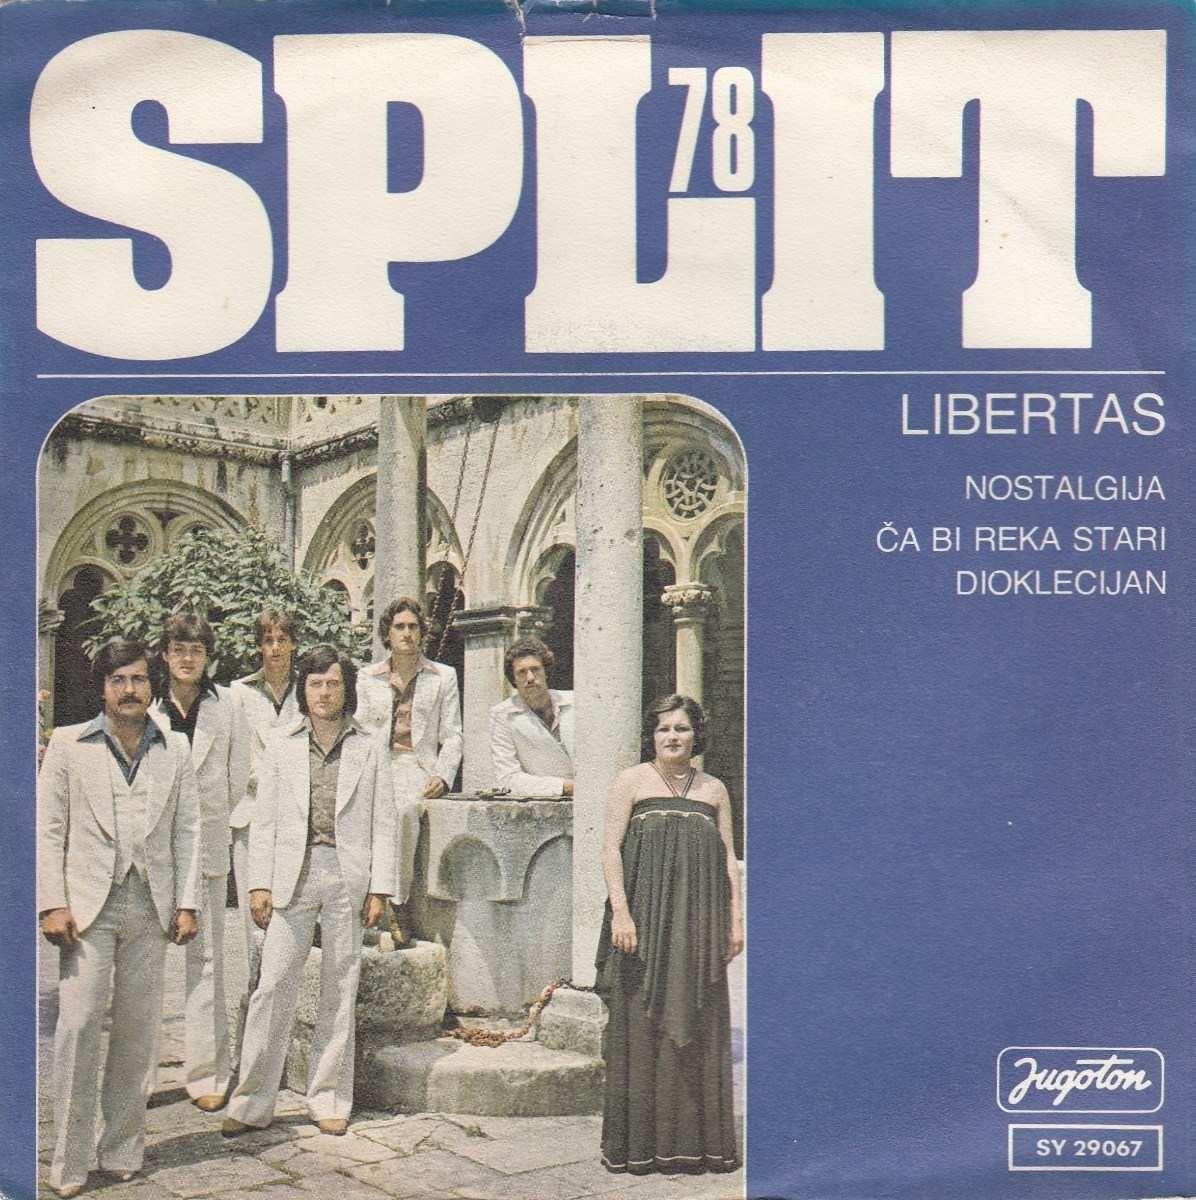 Libertas - Nostalgija/ca Bi Reka Stari Dioklecijan